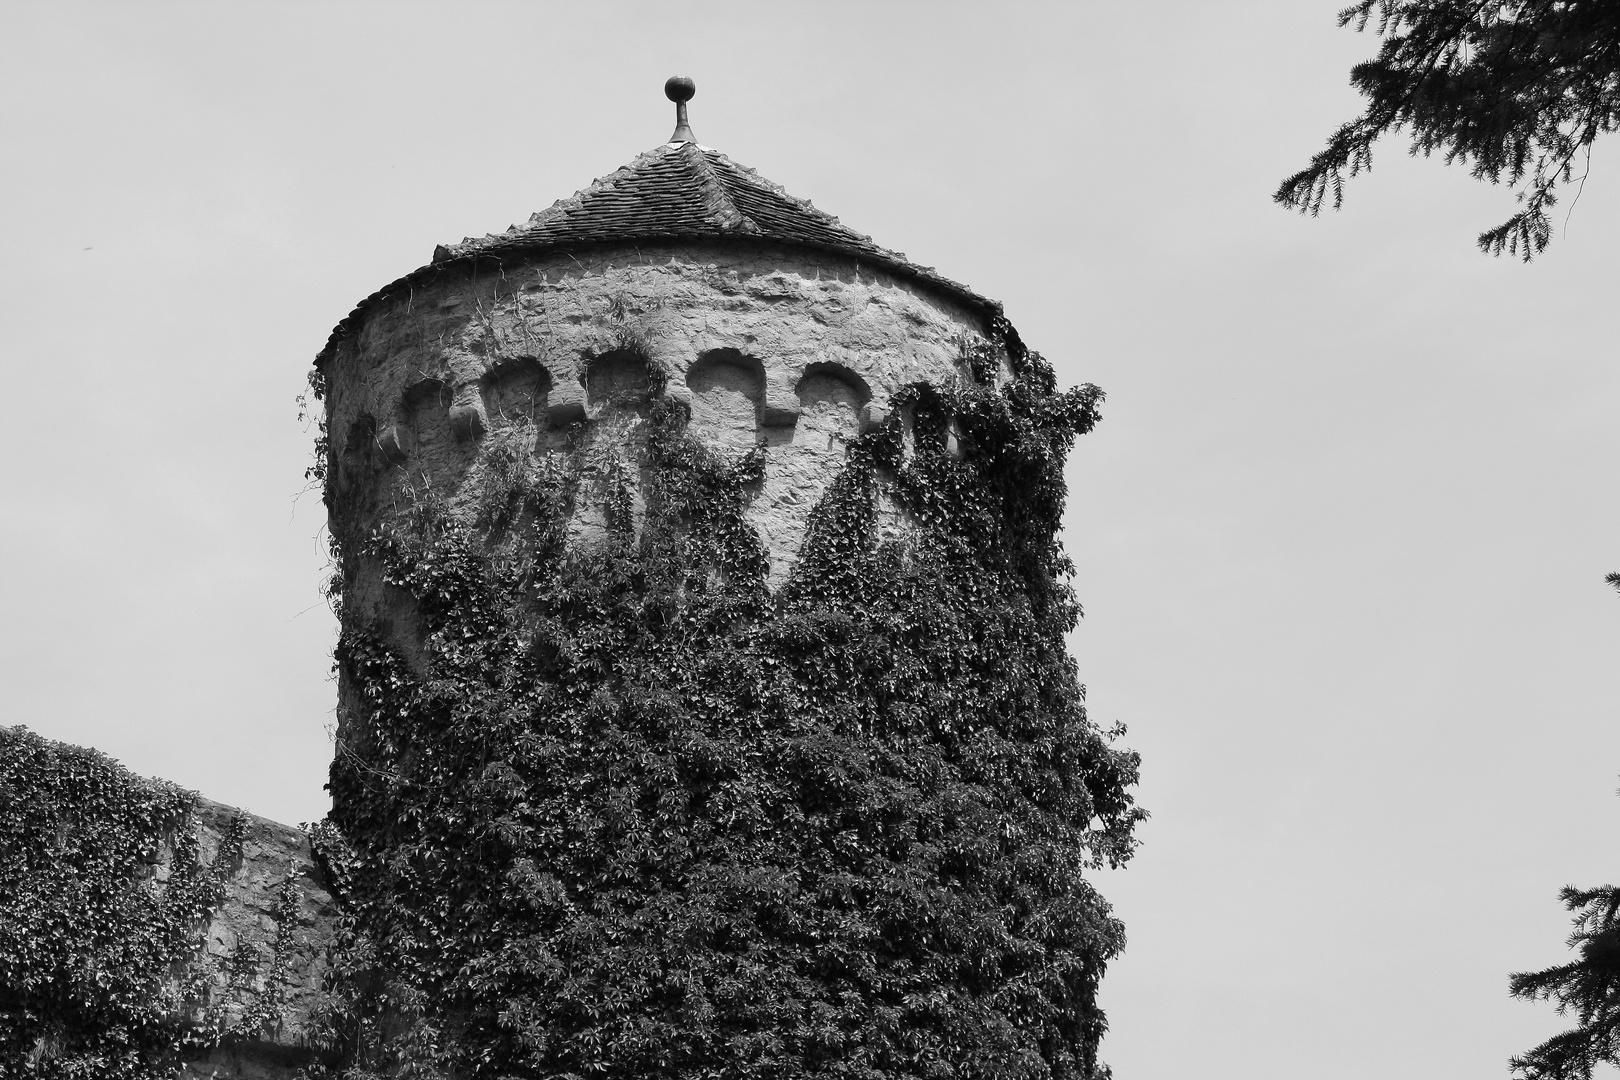 Rapunzelturm